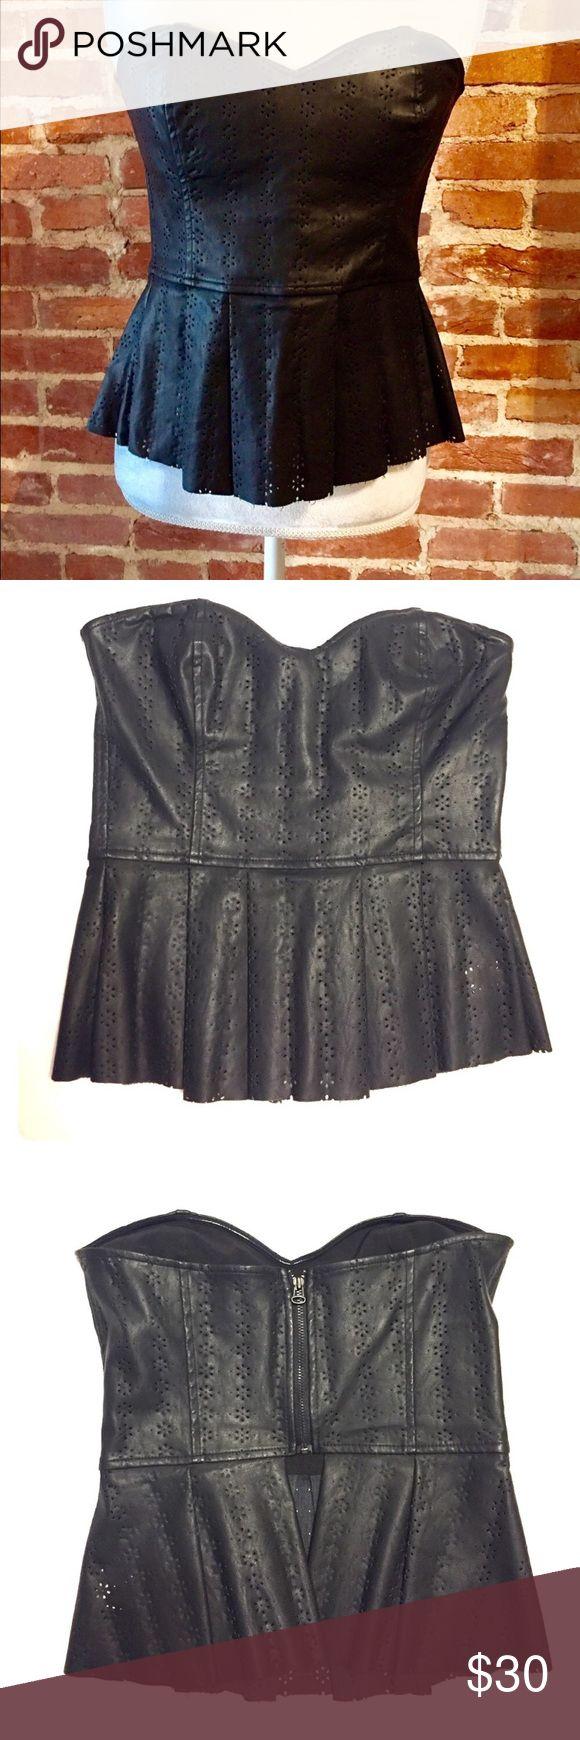 Dolce Vita Leather Peplum Top Sz XS Super cute dolce vita peplum top. Faux leather with detailing (pictured). In EUC! Size XS Dolce Vita Tops Tank Tops